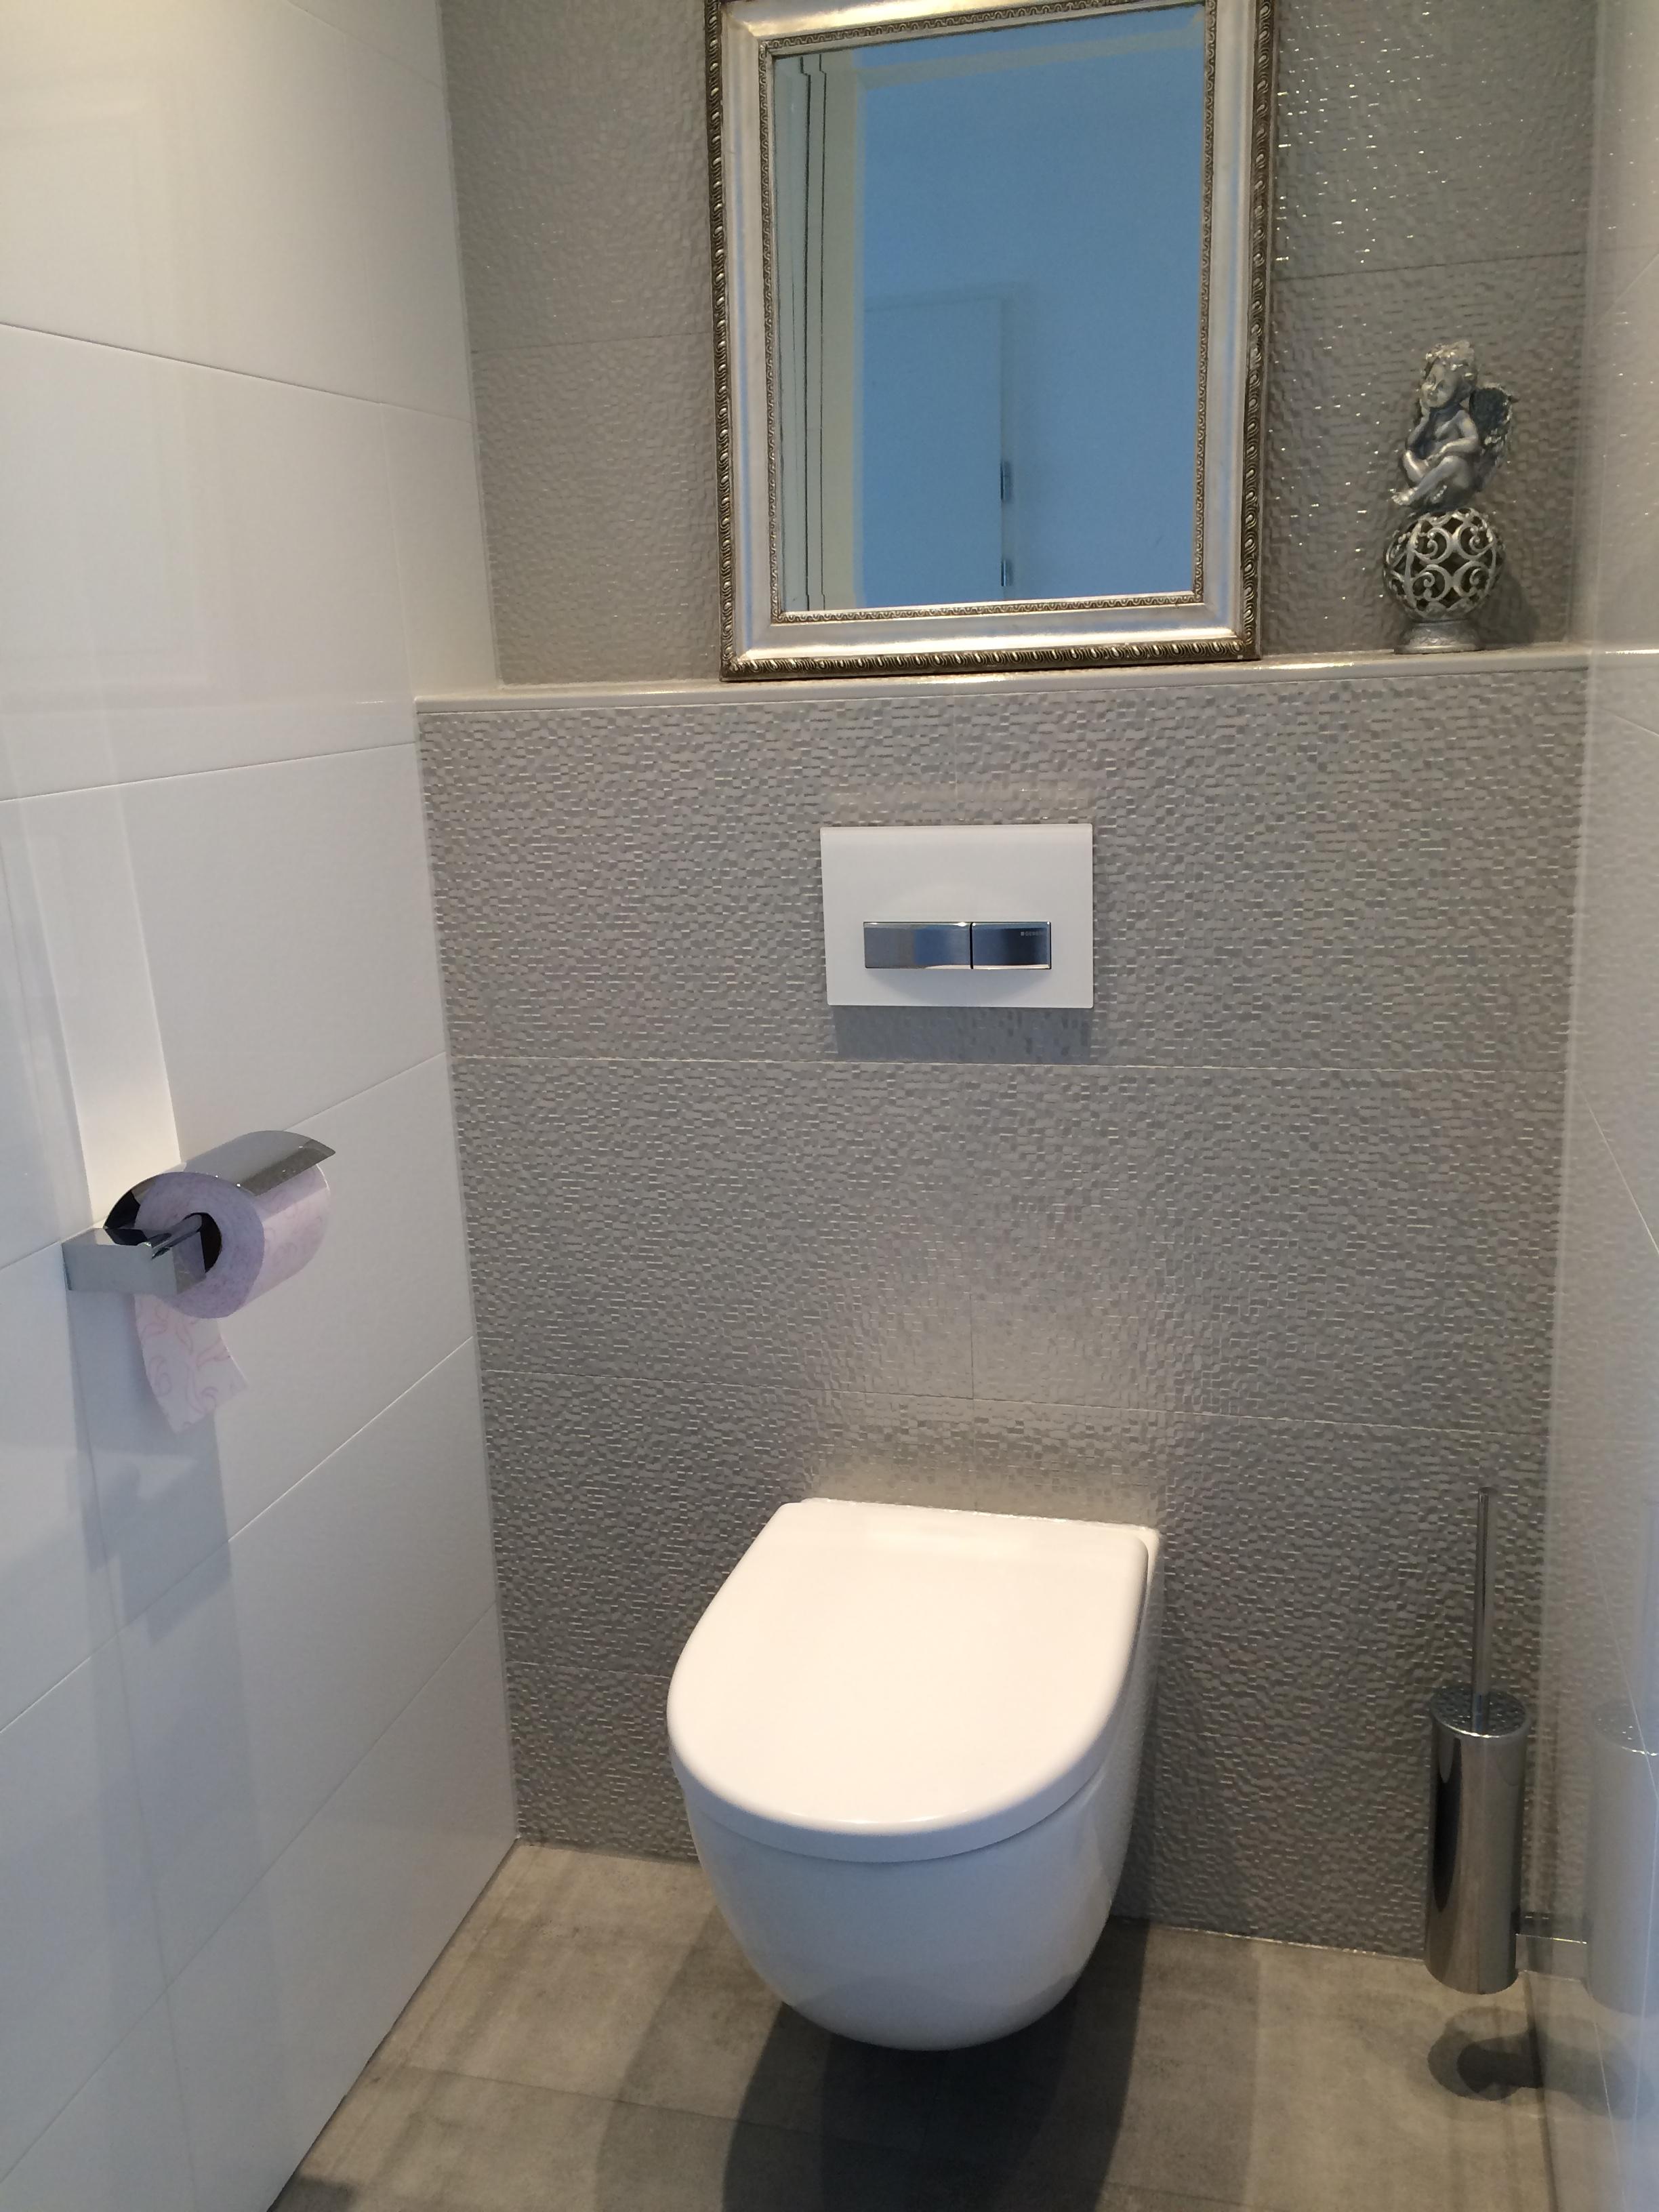 venis cubica toilet tegels toilet tegels pinterest toilet